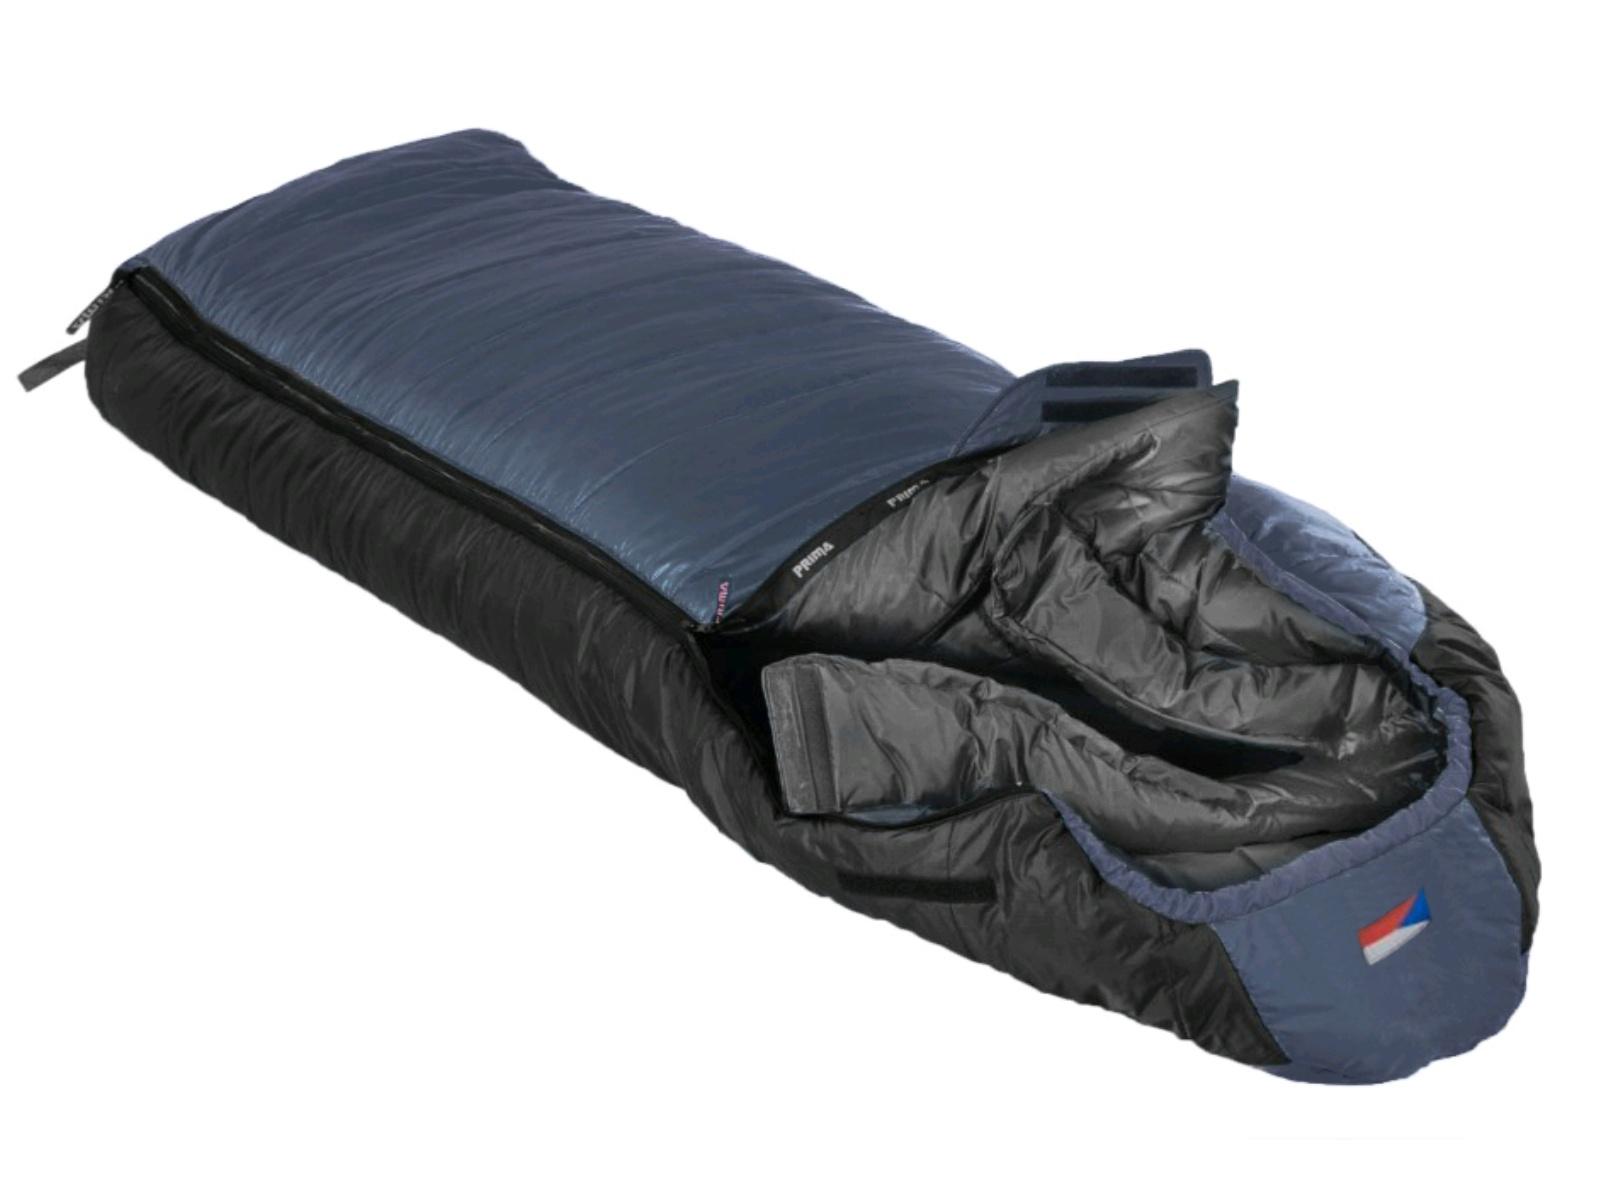 Spací vak PRIMA Makalu 230 Comfortable modrý - ľavý zips